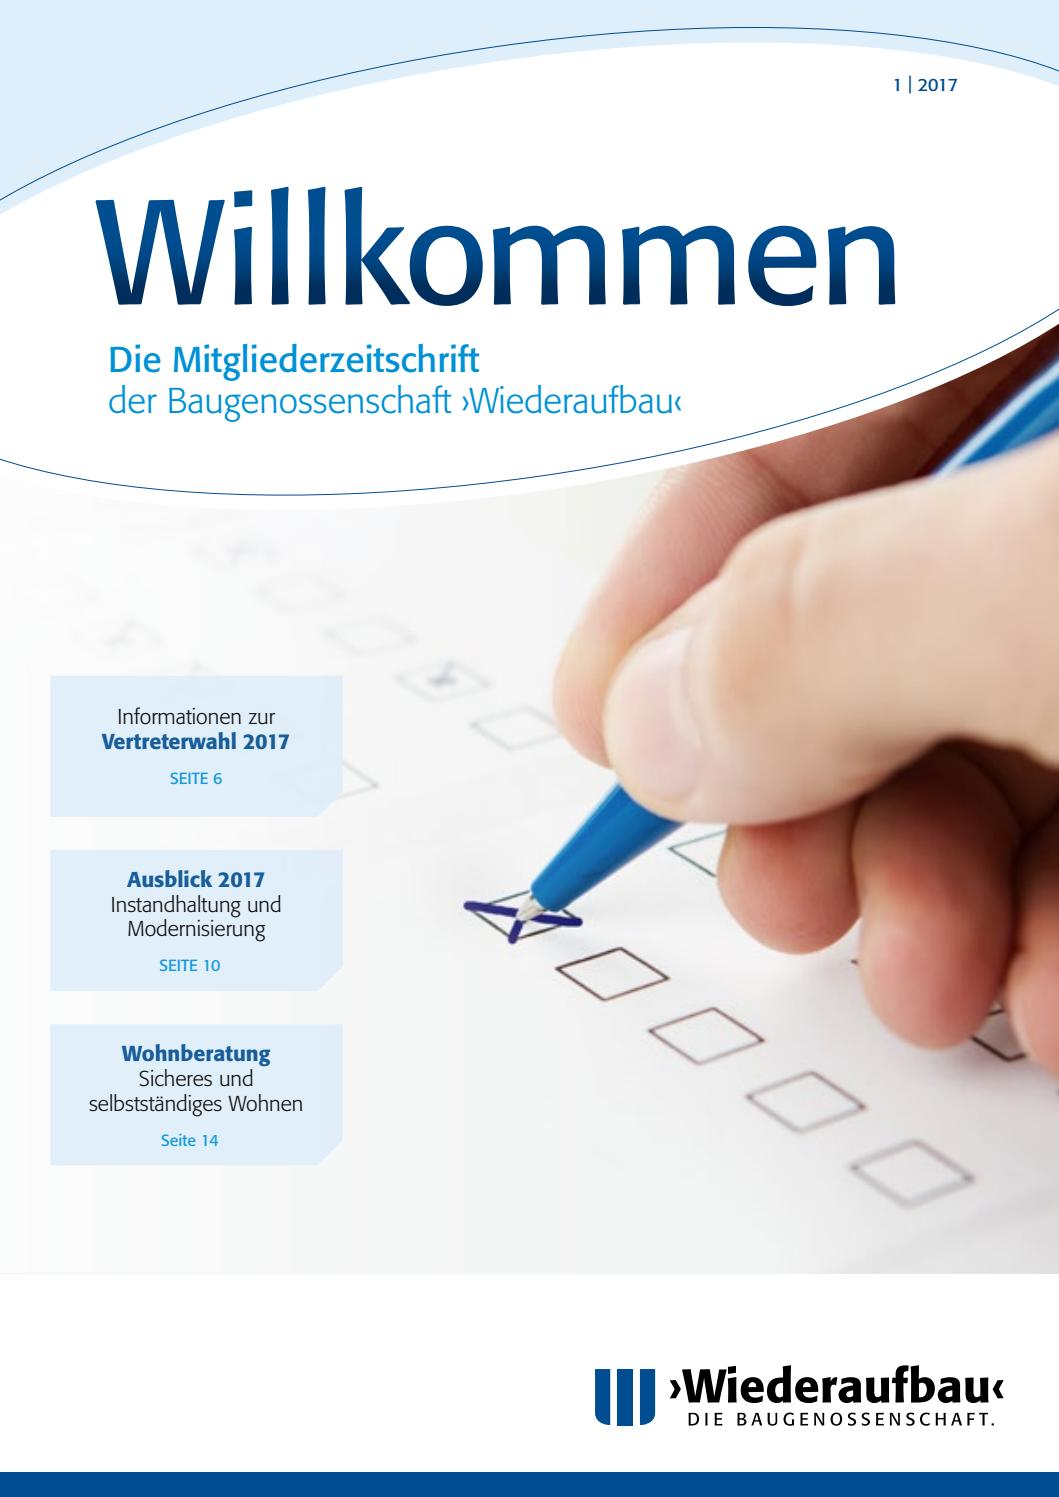 Wiederaufbau Willkommen 1|2017 by wiederaufbau - issuu